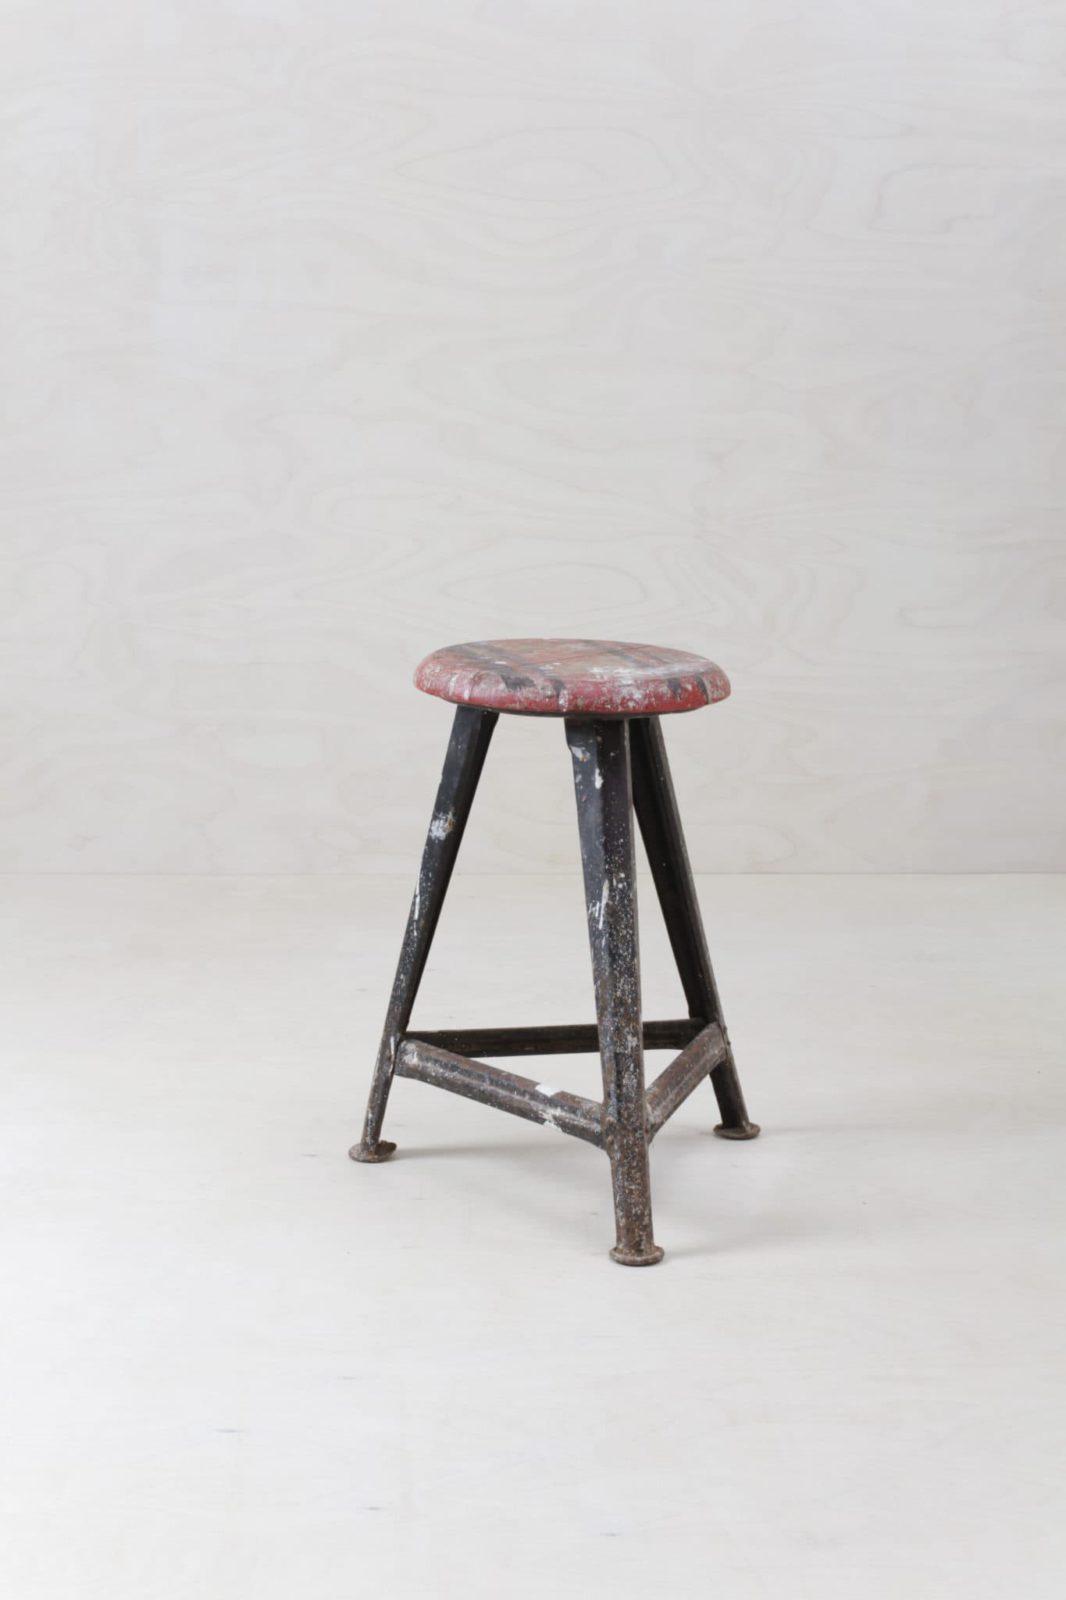 Stool Alarico Vintage Rowac | Original Rowac stool for a nice industrial look. | gotvintage Rental & Event Design